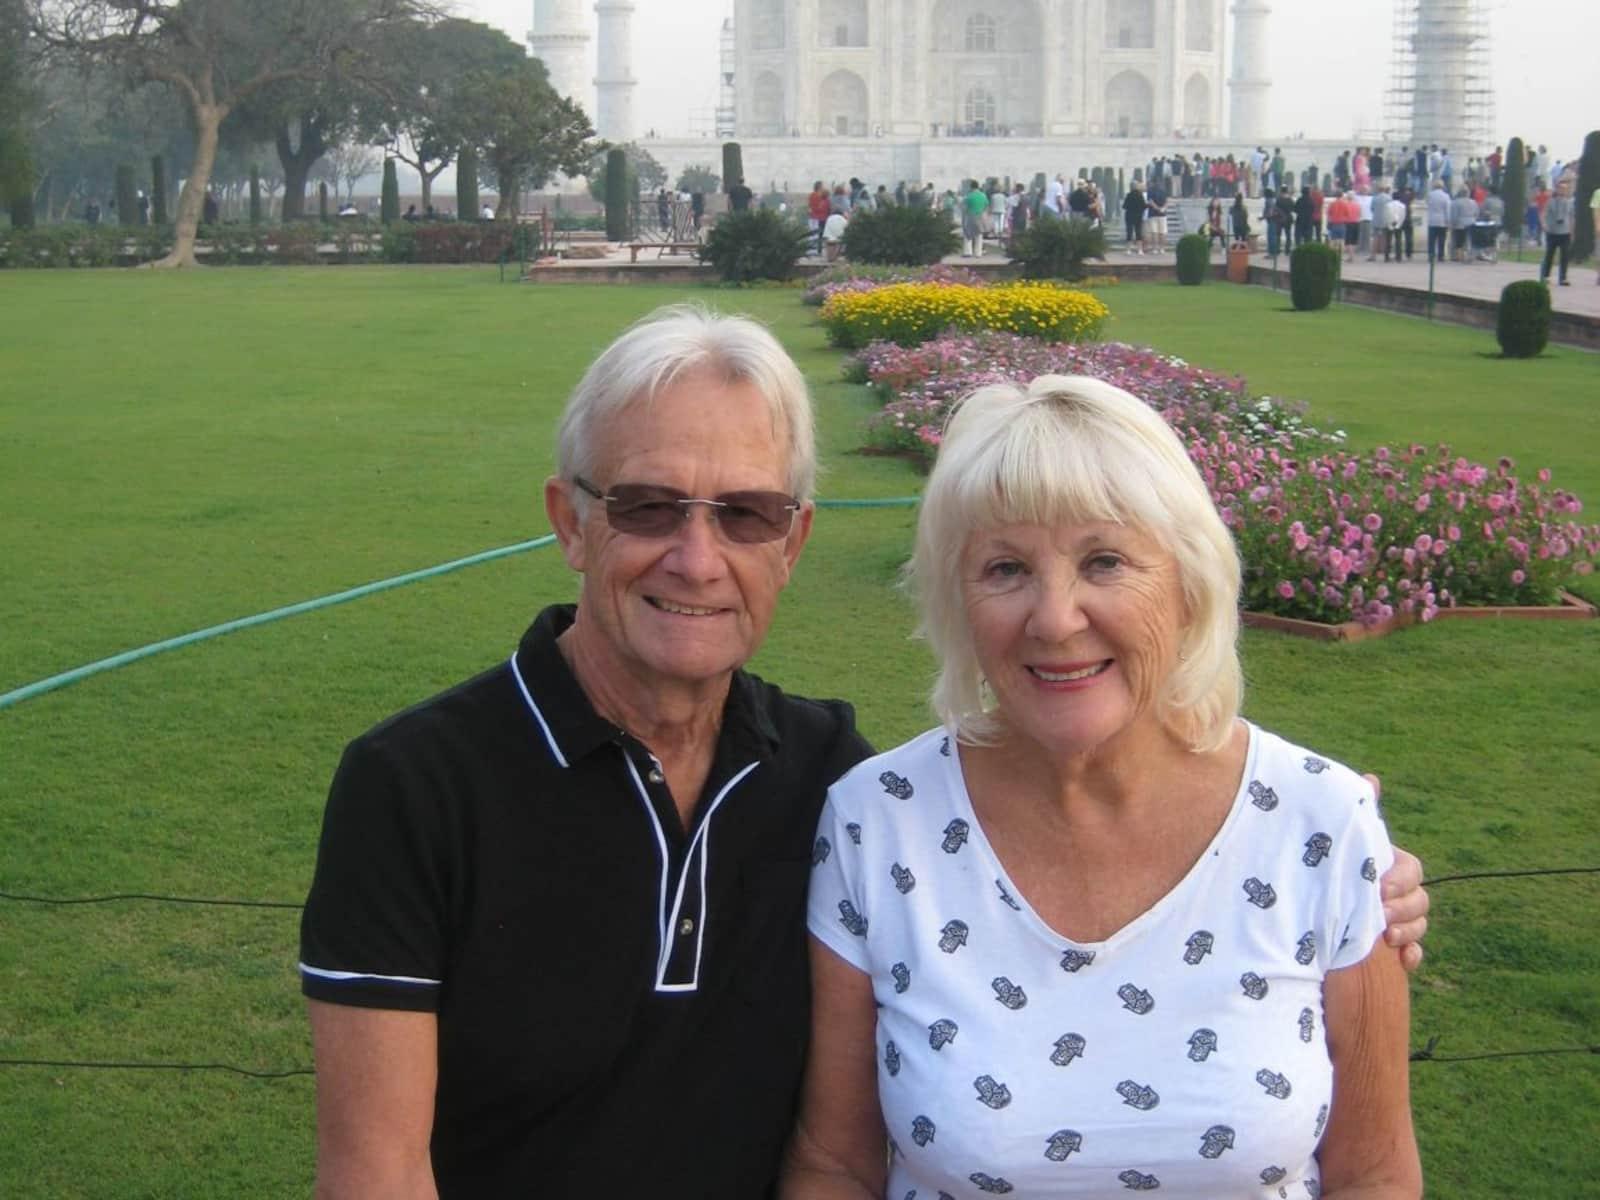 Jane & Gordon from Poole, United Kingdom